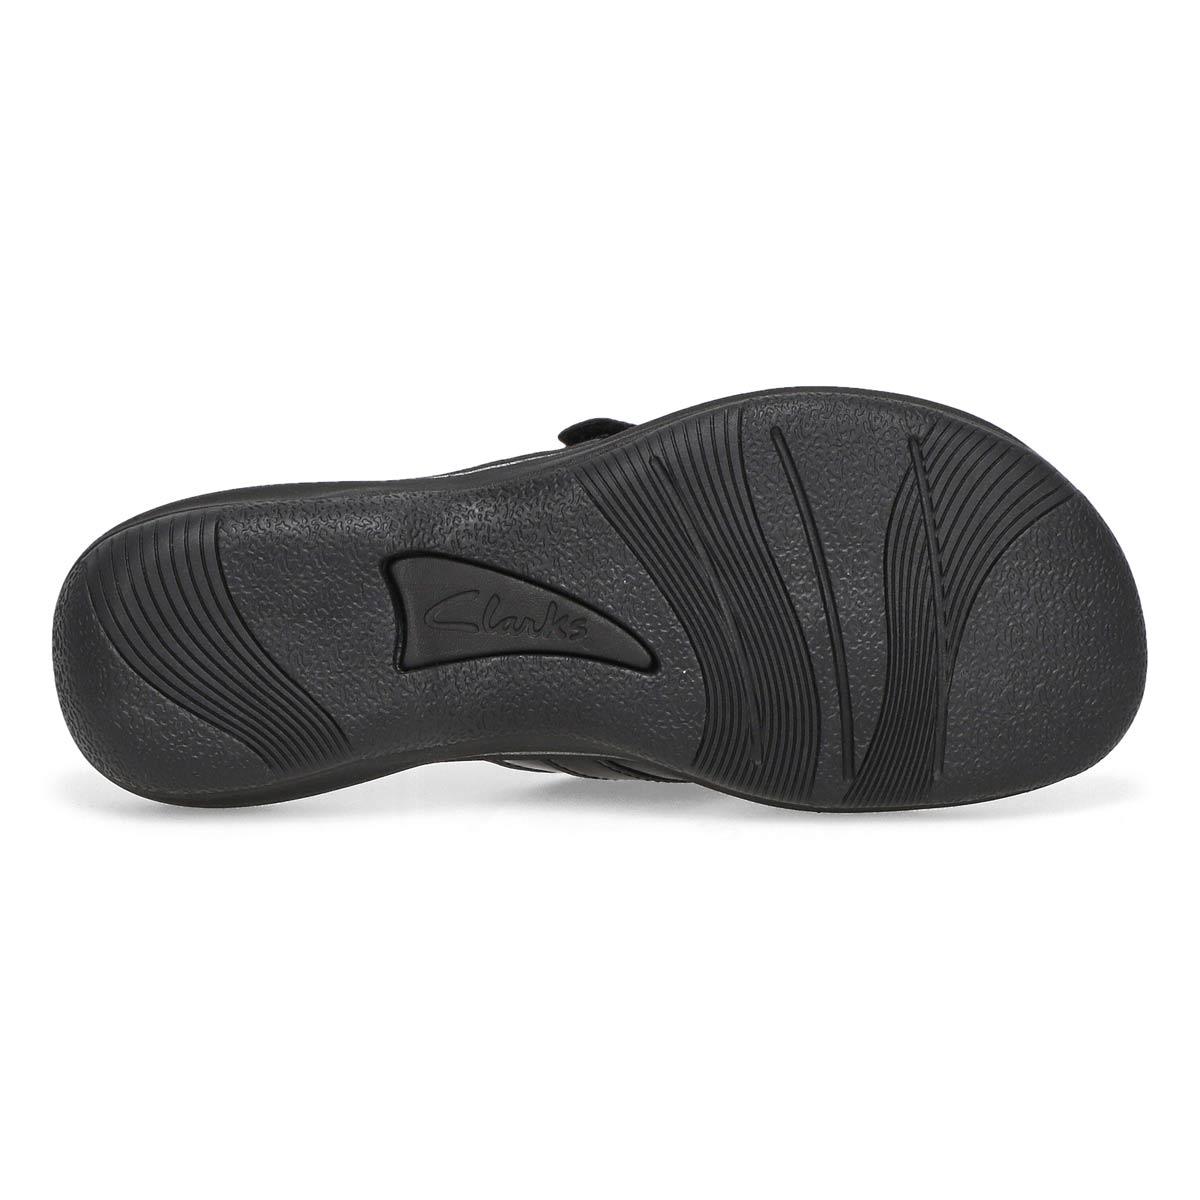 Lds Breeze Sea black pat thong sandal